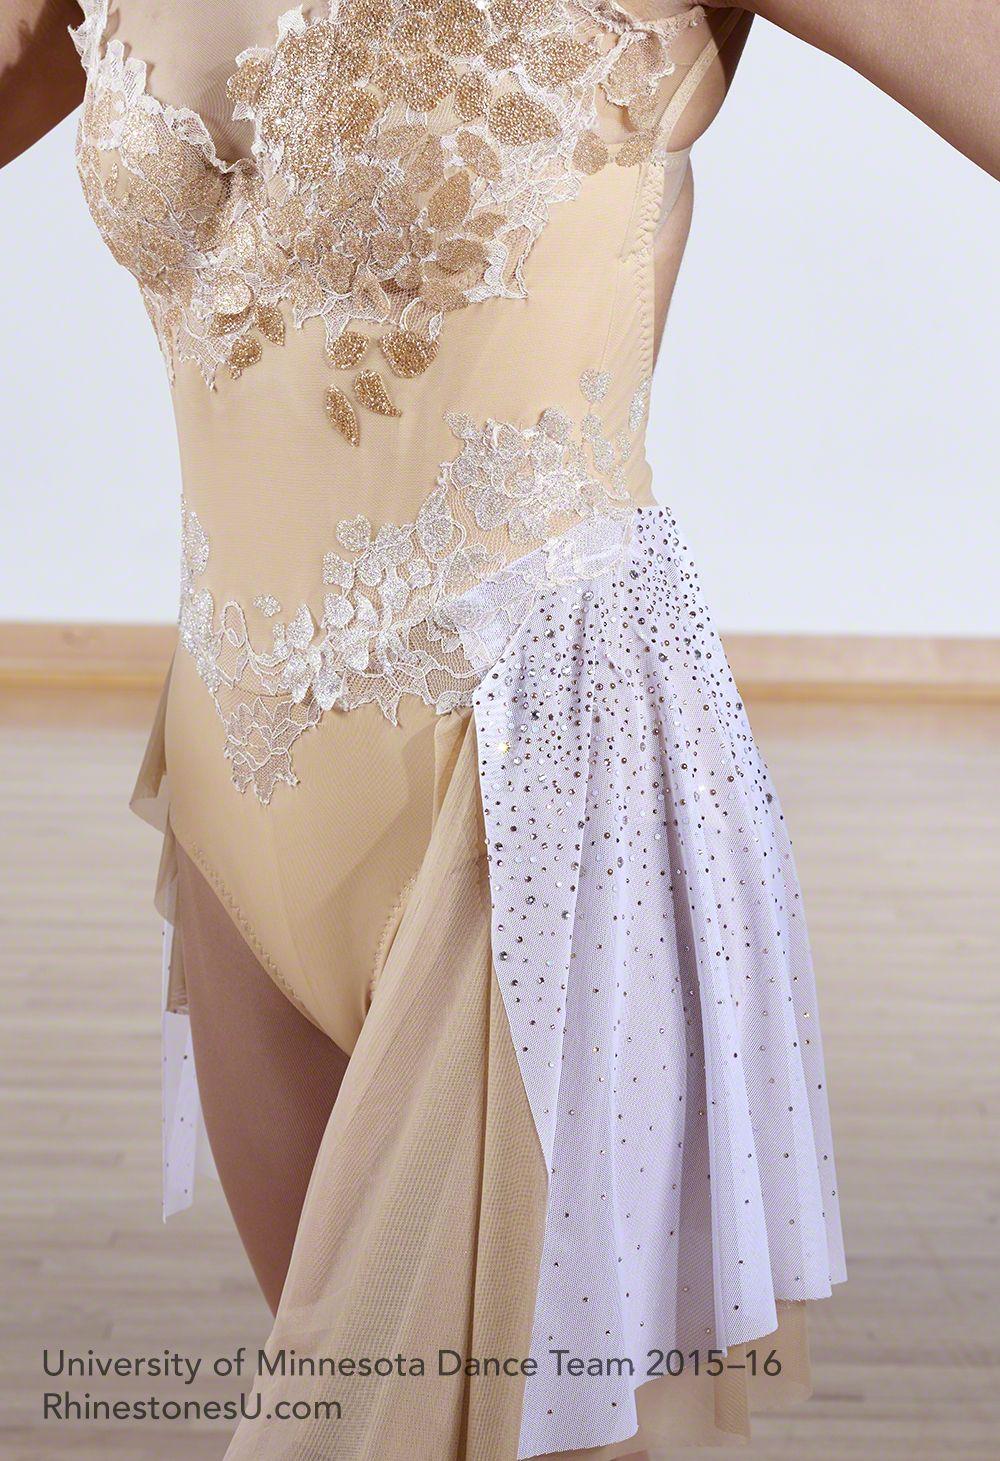 d83ca422e Pin by Tricia Copelin on Dance Costumes in 2019   Contemporary dance ...